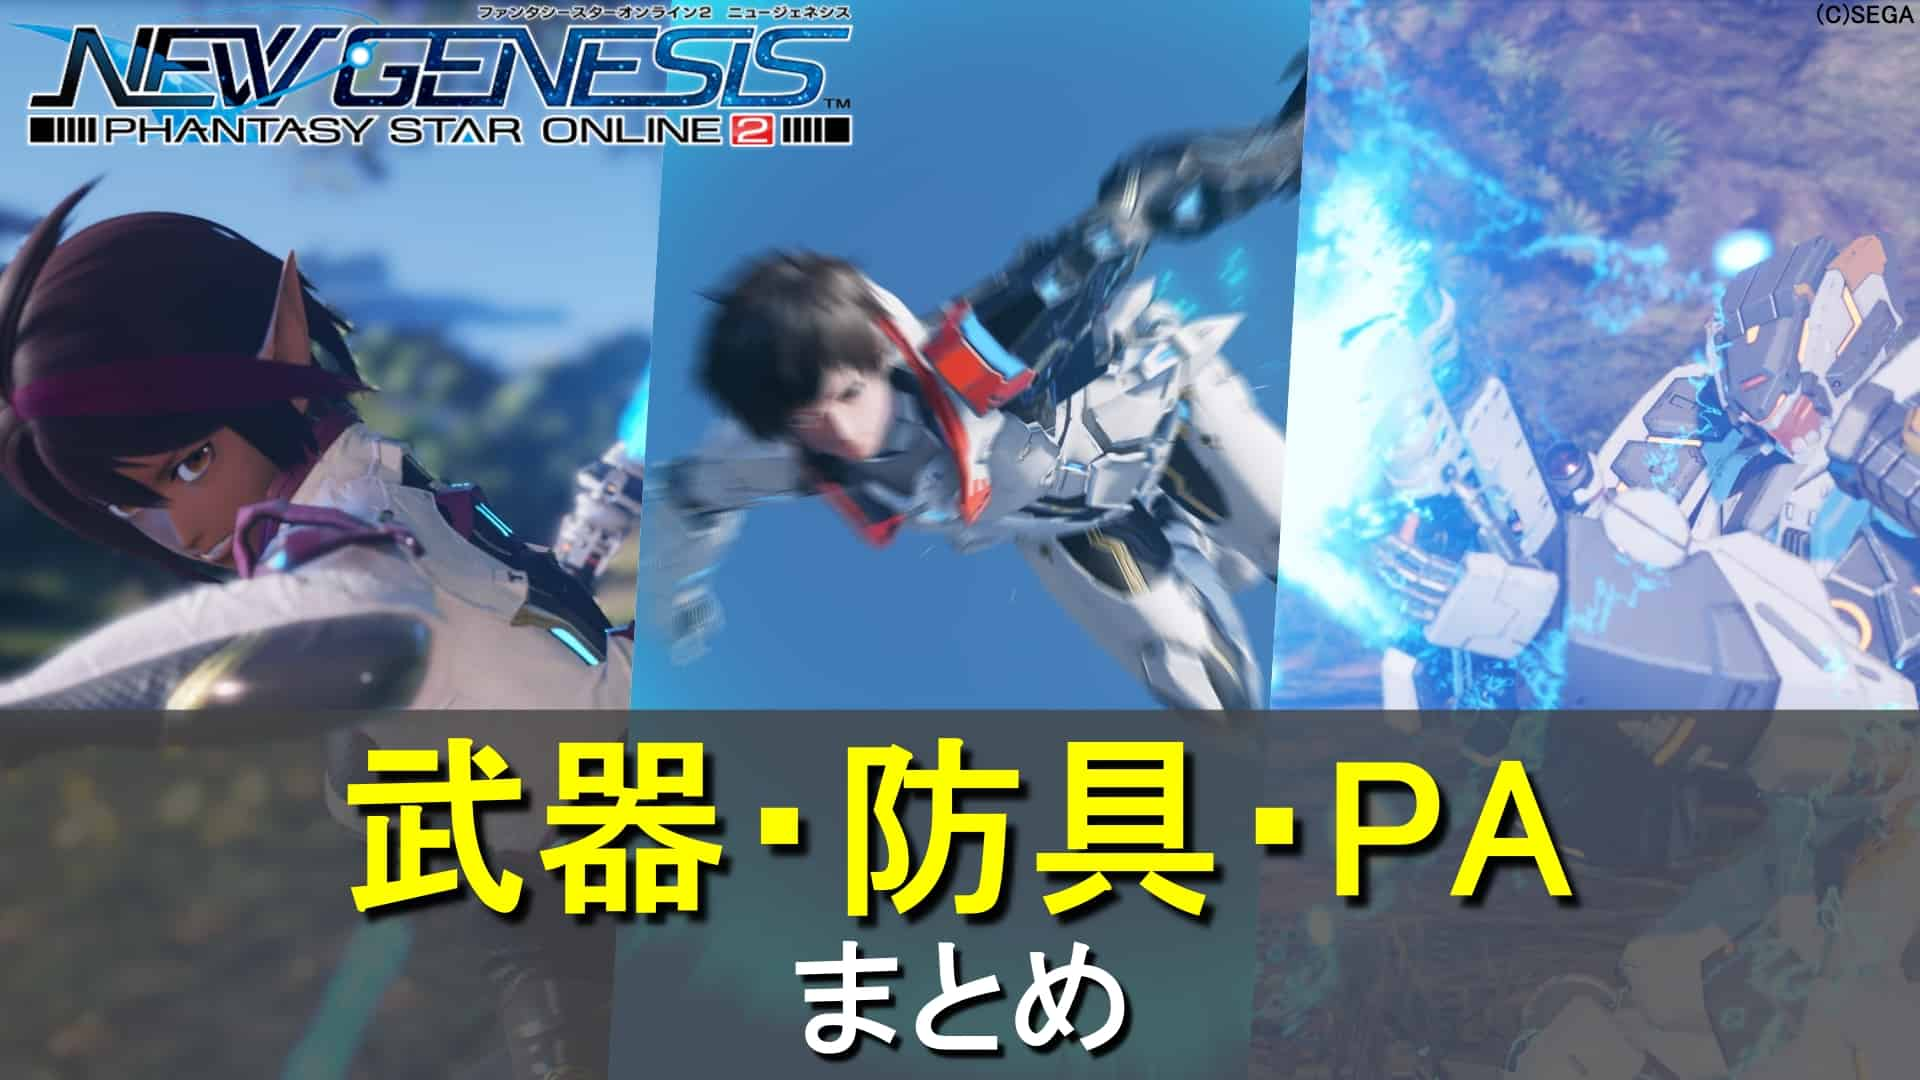 【PSO2NGS】全装備(武器・防具)、PA、最強比較まとめ